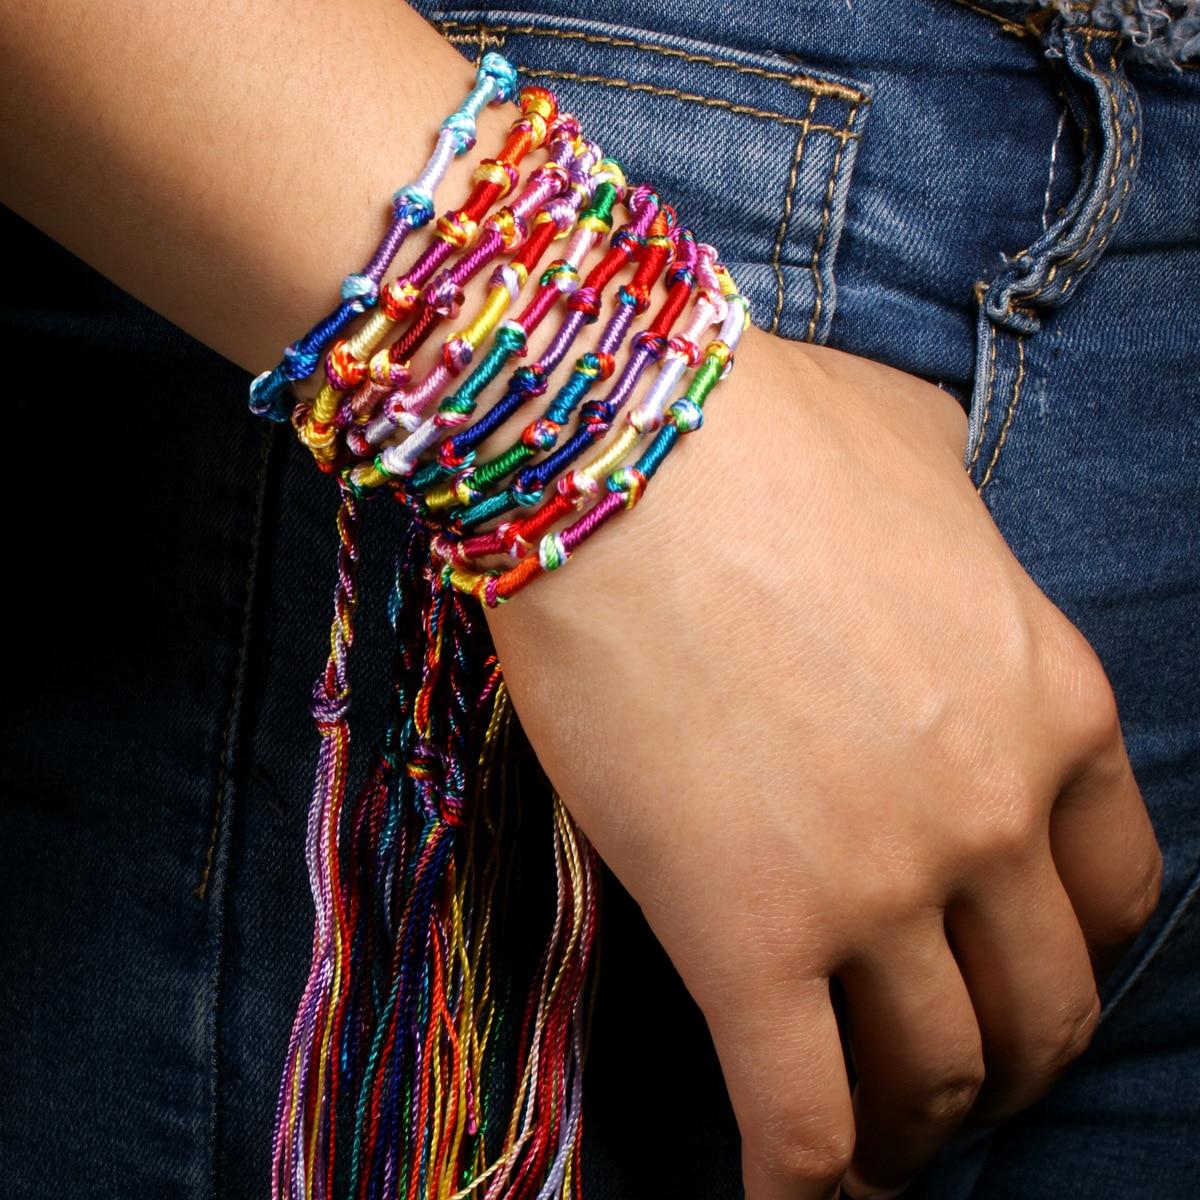 10pc Colorful Woven Braided Friendship Bracelet Handmade Brazilian String Cotton Cord Hippie Surf Men Women Jewelry Gift